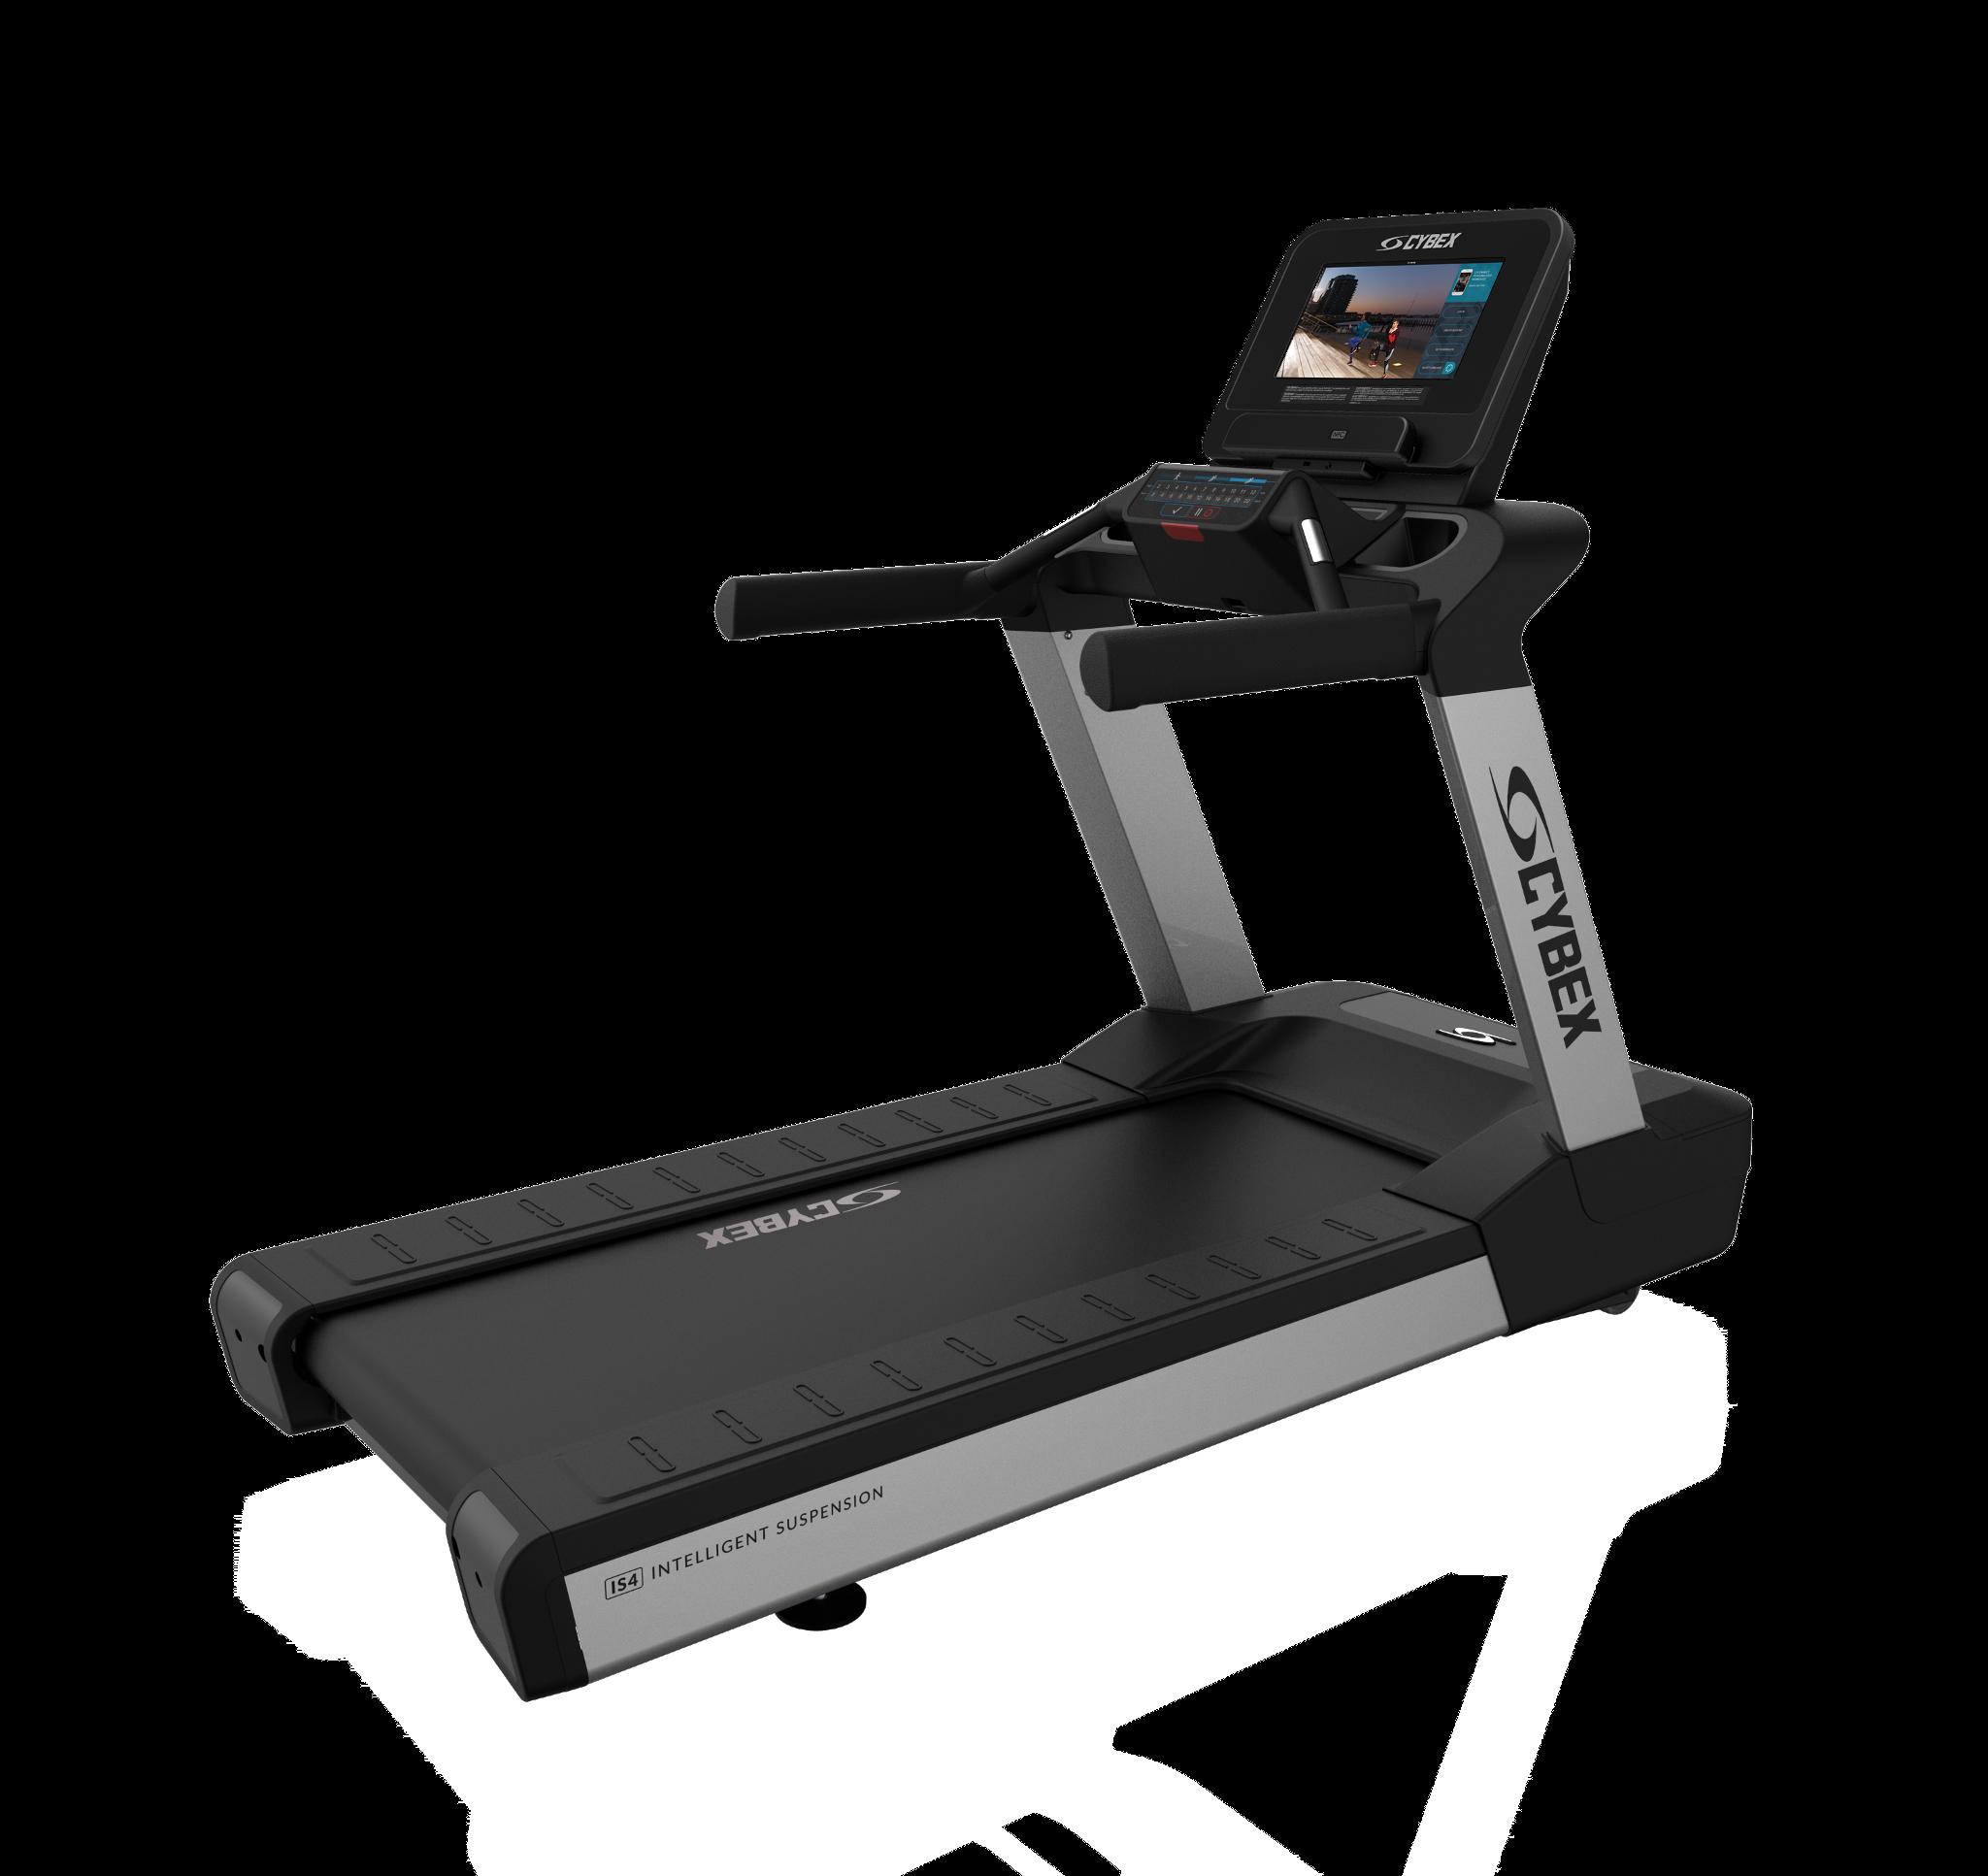 cybex treadmill price